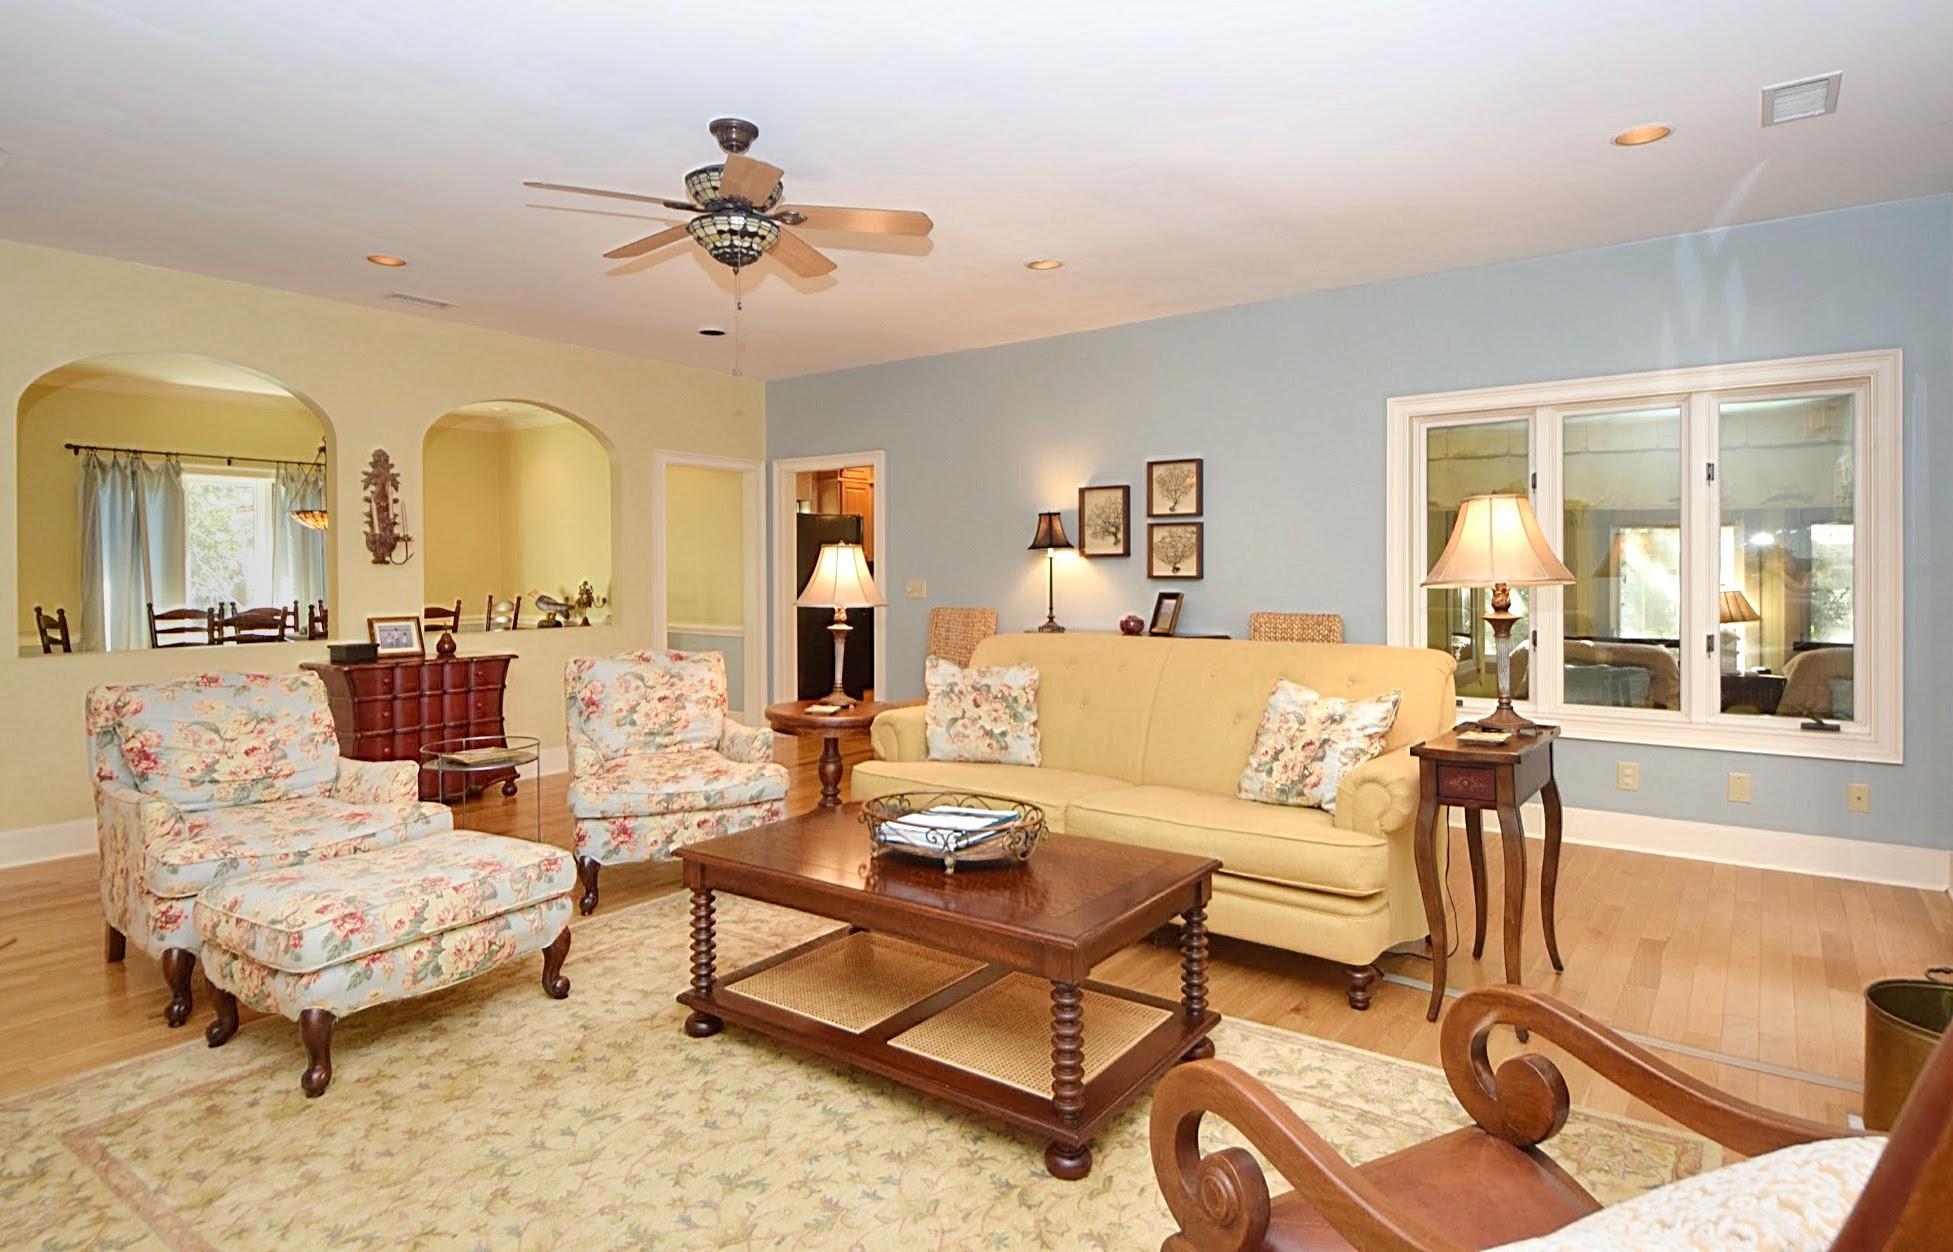 Kiawah Island Homes For Sale - 132 Governors, Kiawah Island, SC - 11